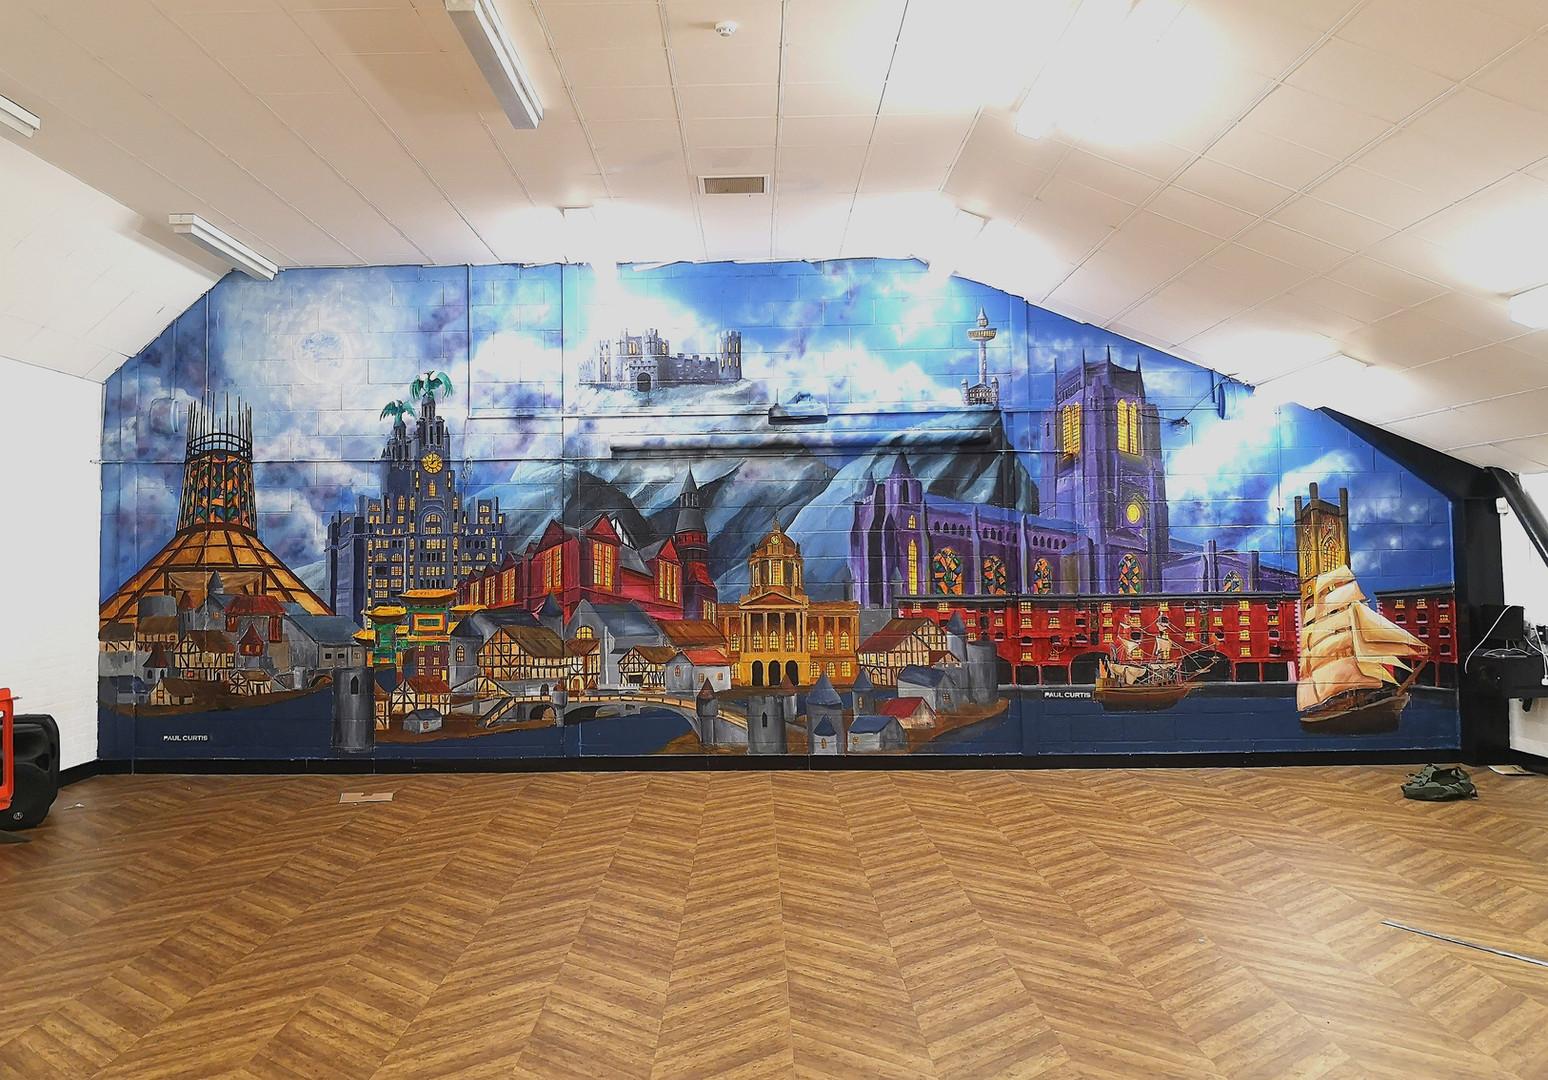 Liverpool Harry Potter mural, Paul Curti